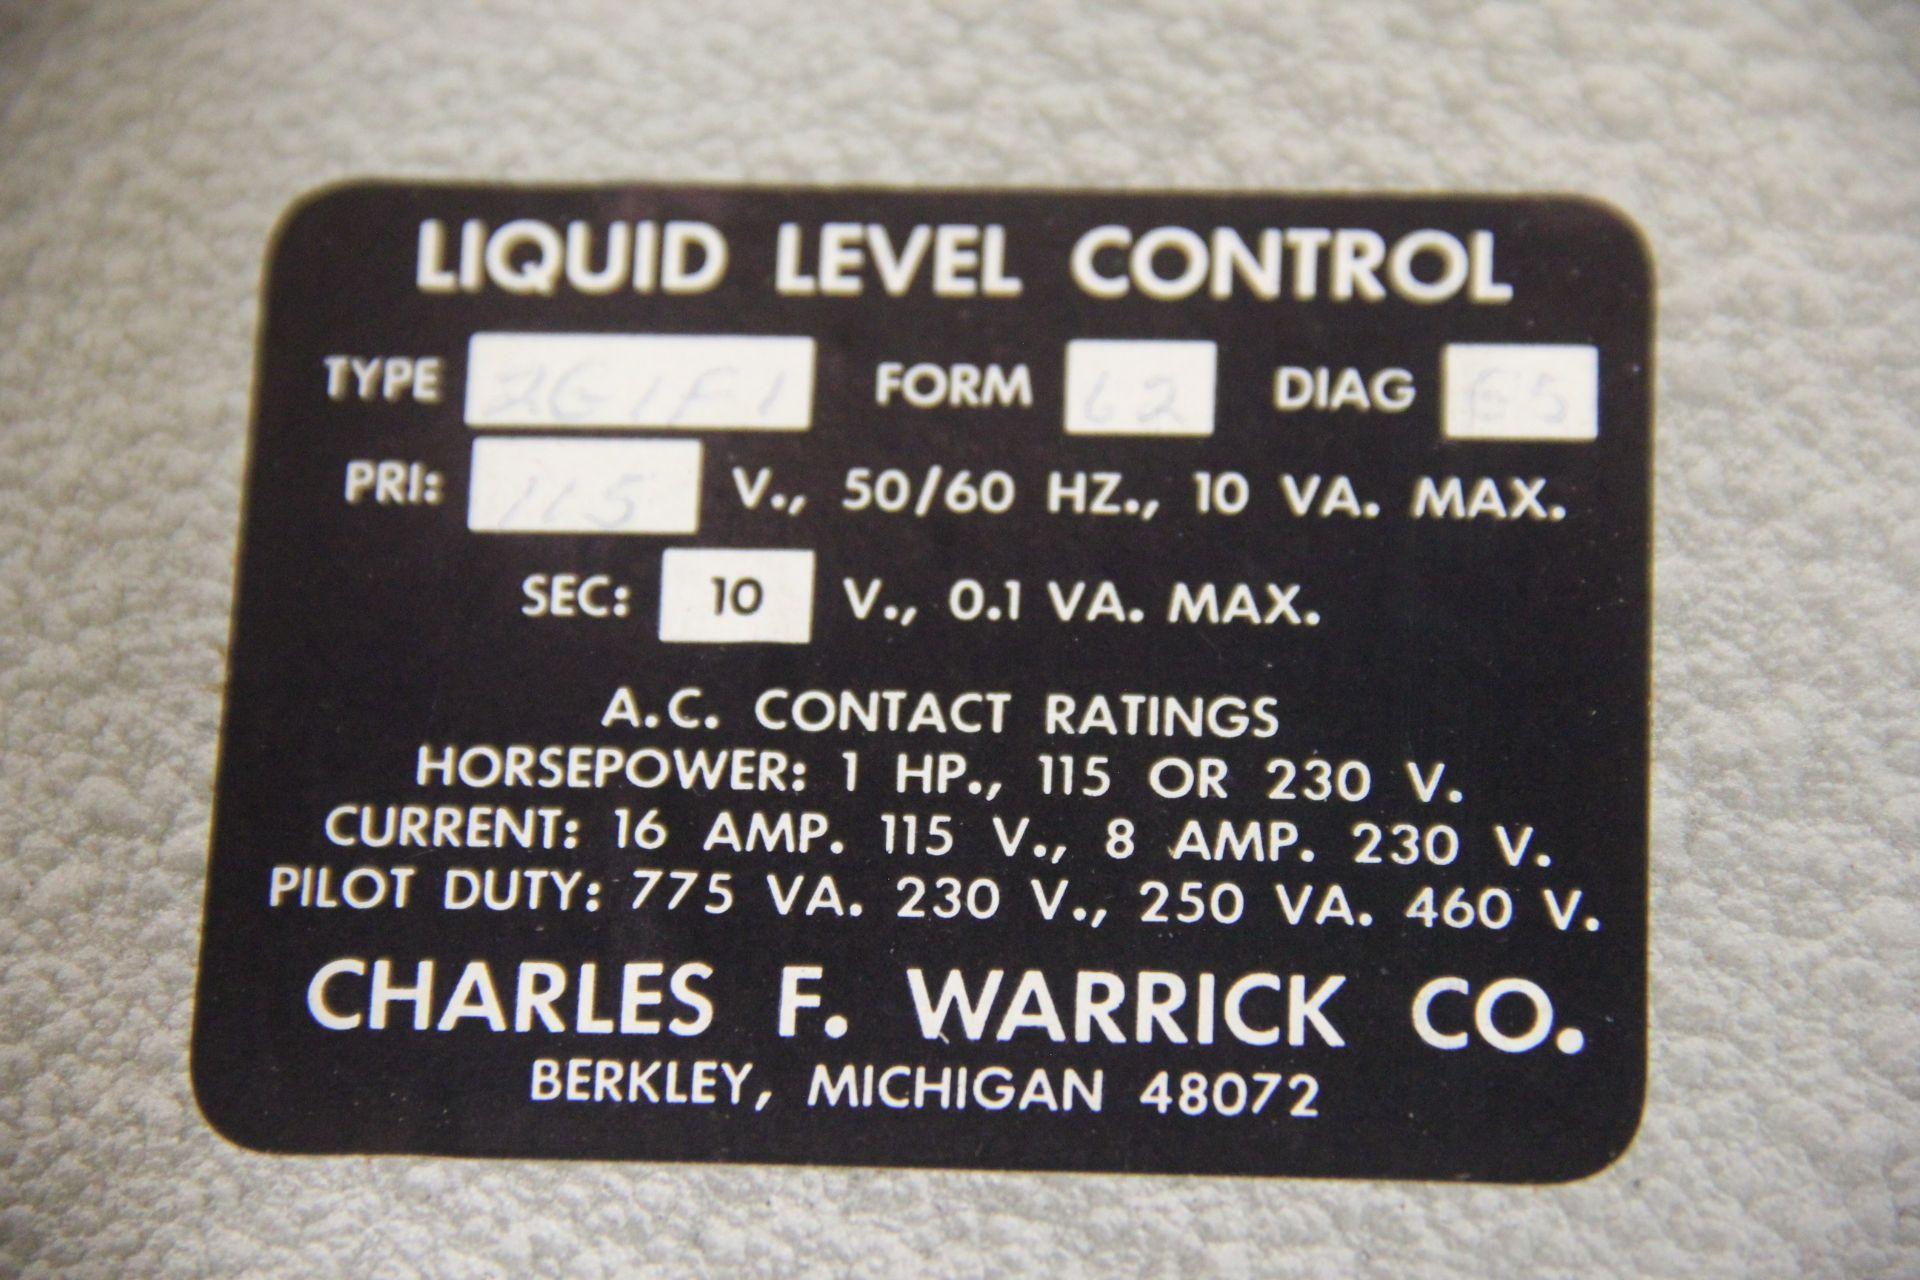 NEW WARRICK LIQUID LEVEL CONTROL - Image 3 of 3